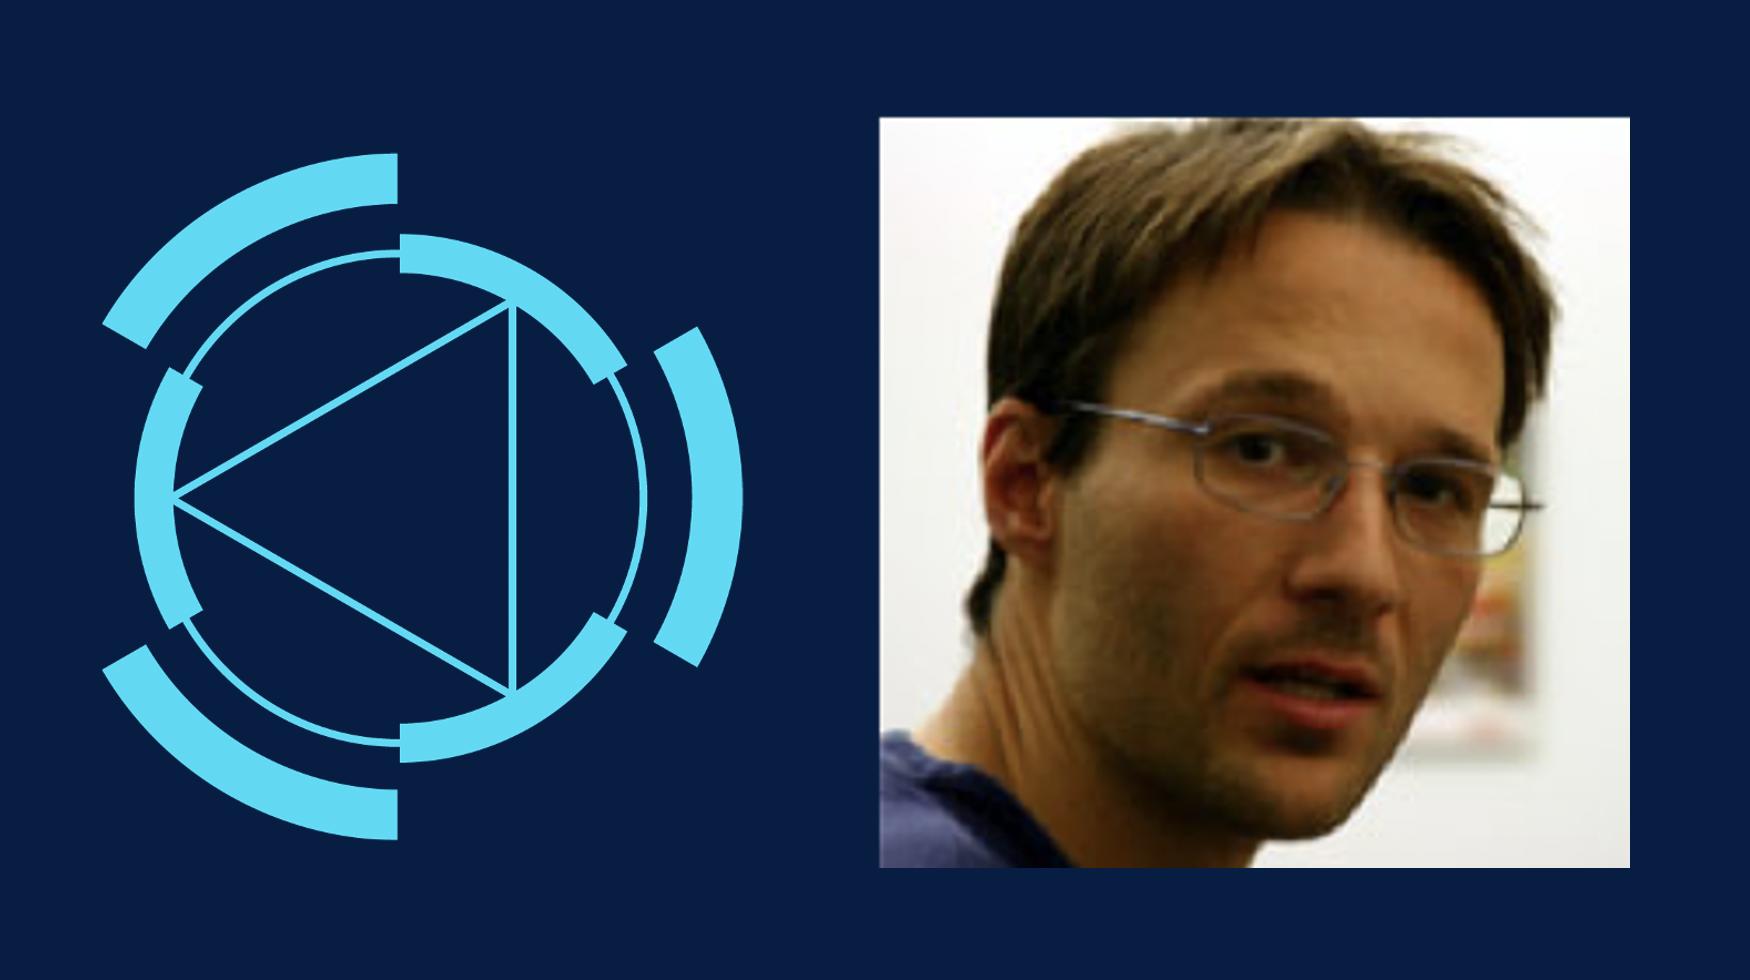 Part 2: Professor Boris Motik